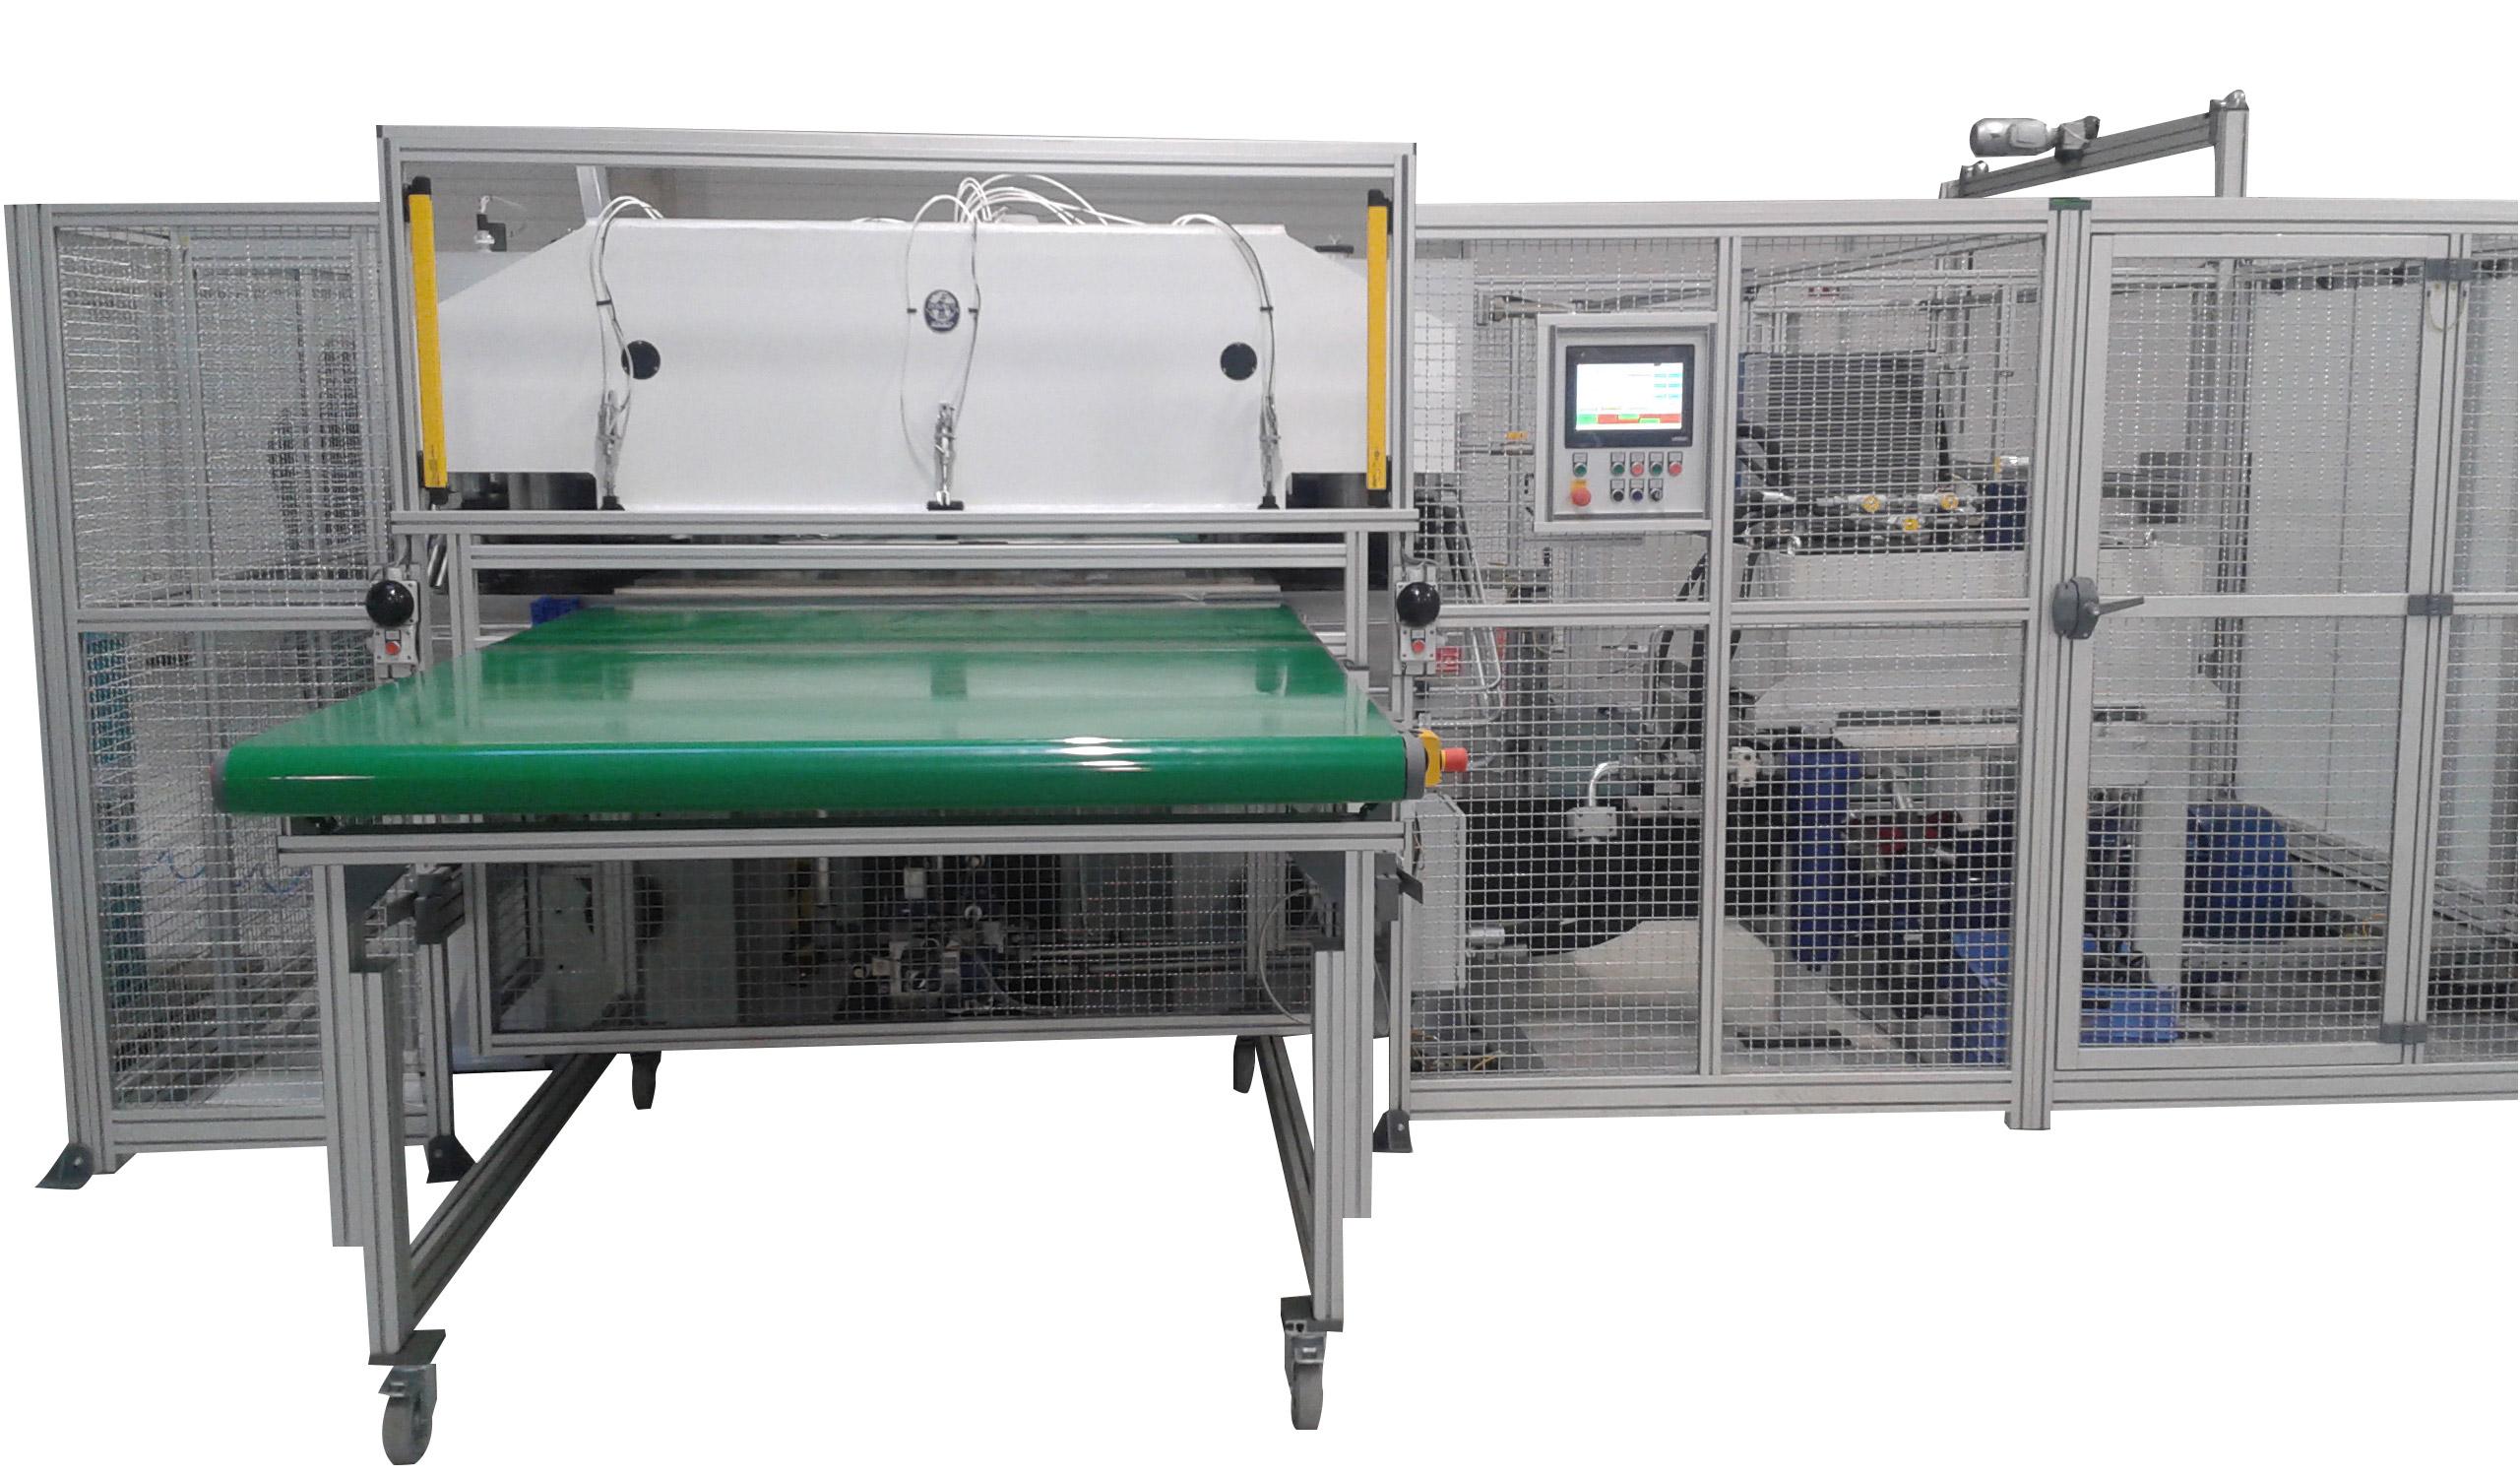 GA2000.1    1600x1600 mm   300 ton